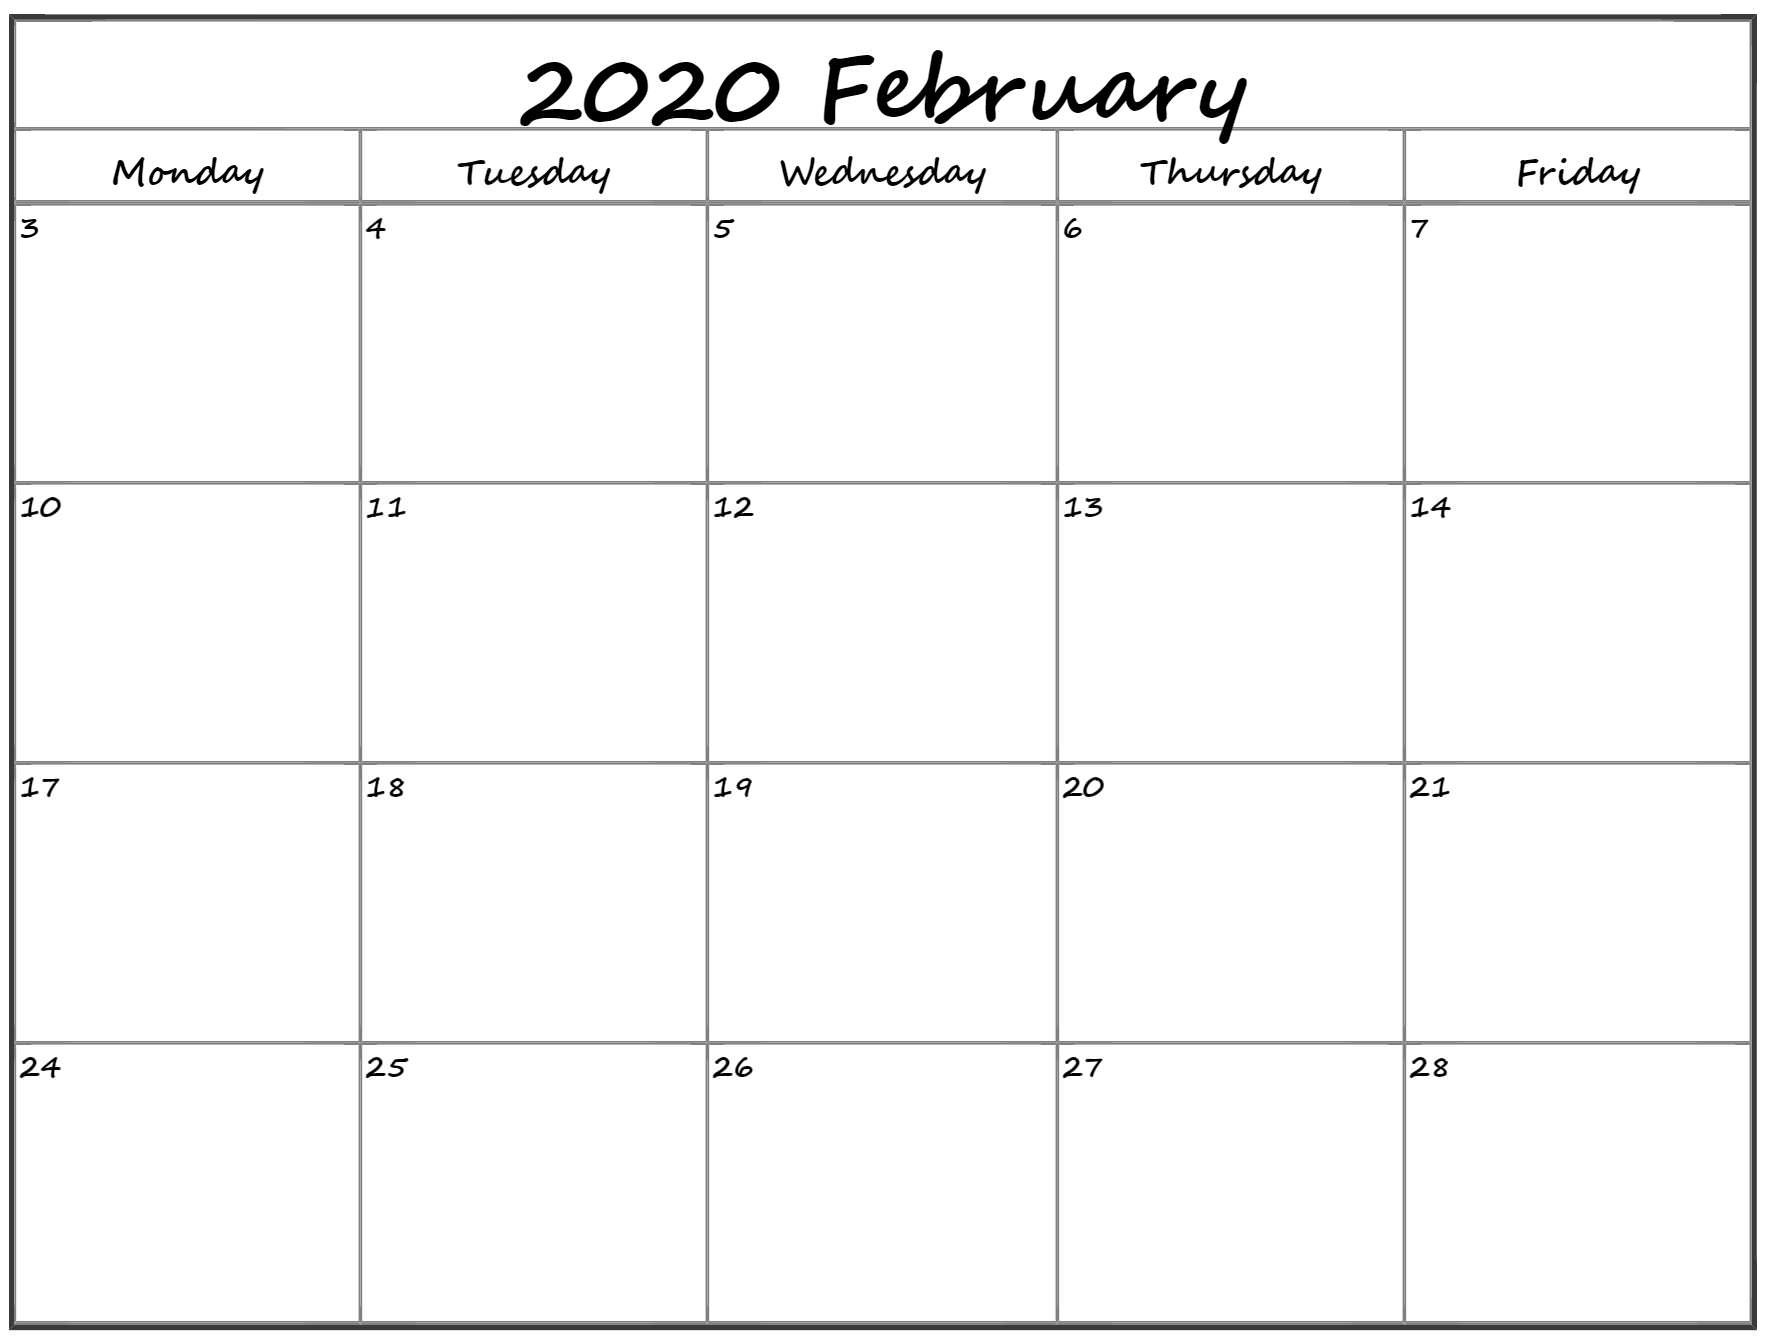 February 2020 Monday Calendar   Monday To Sunday